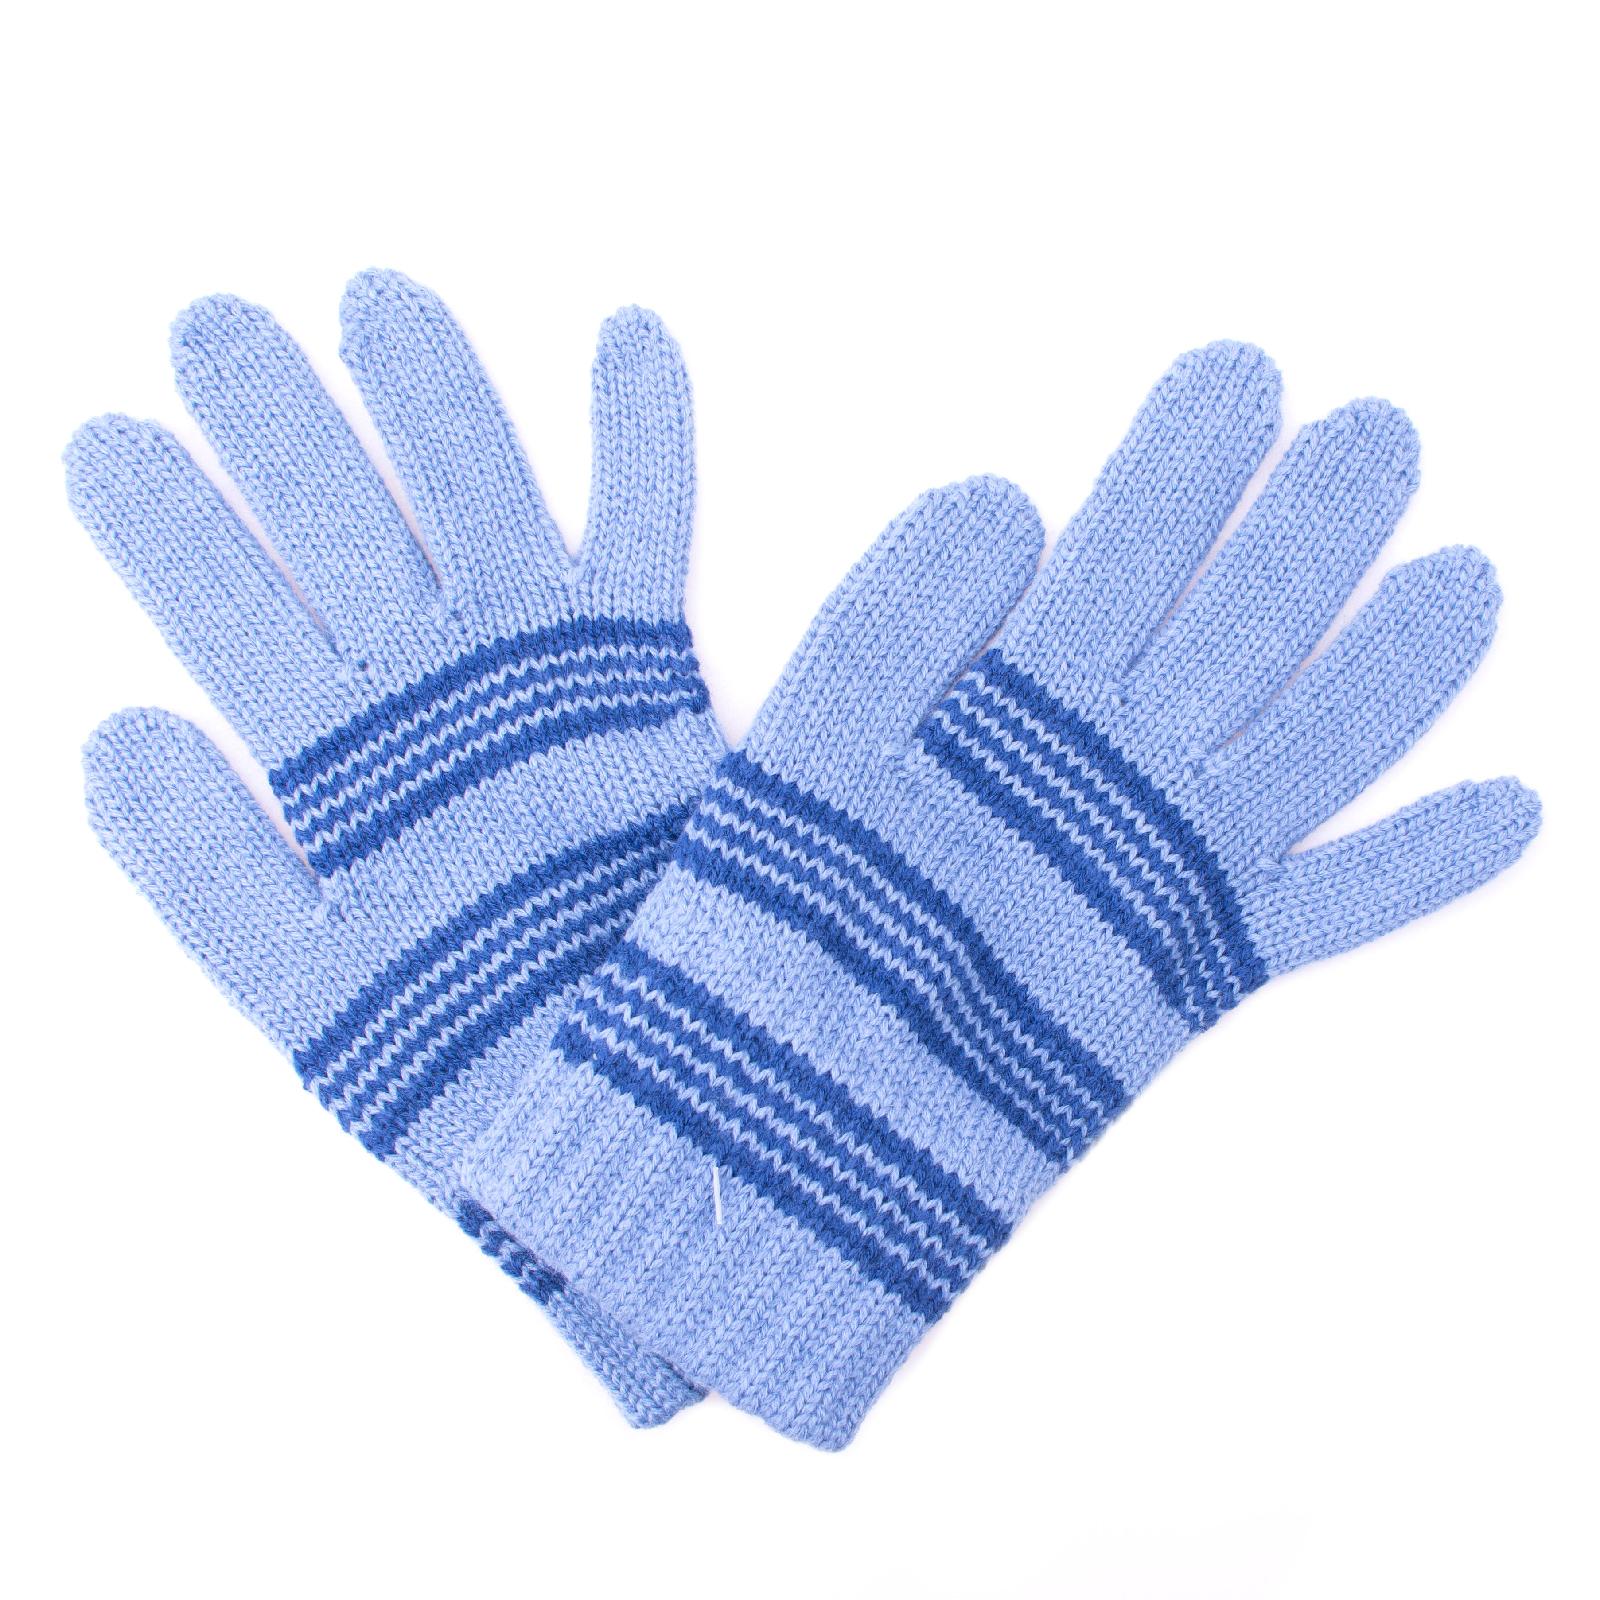 Rukavice (Gloves)